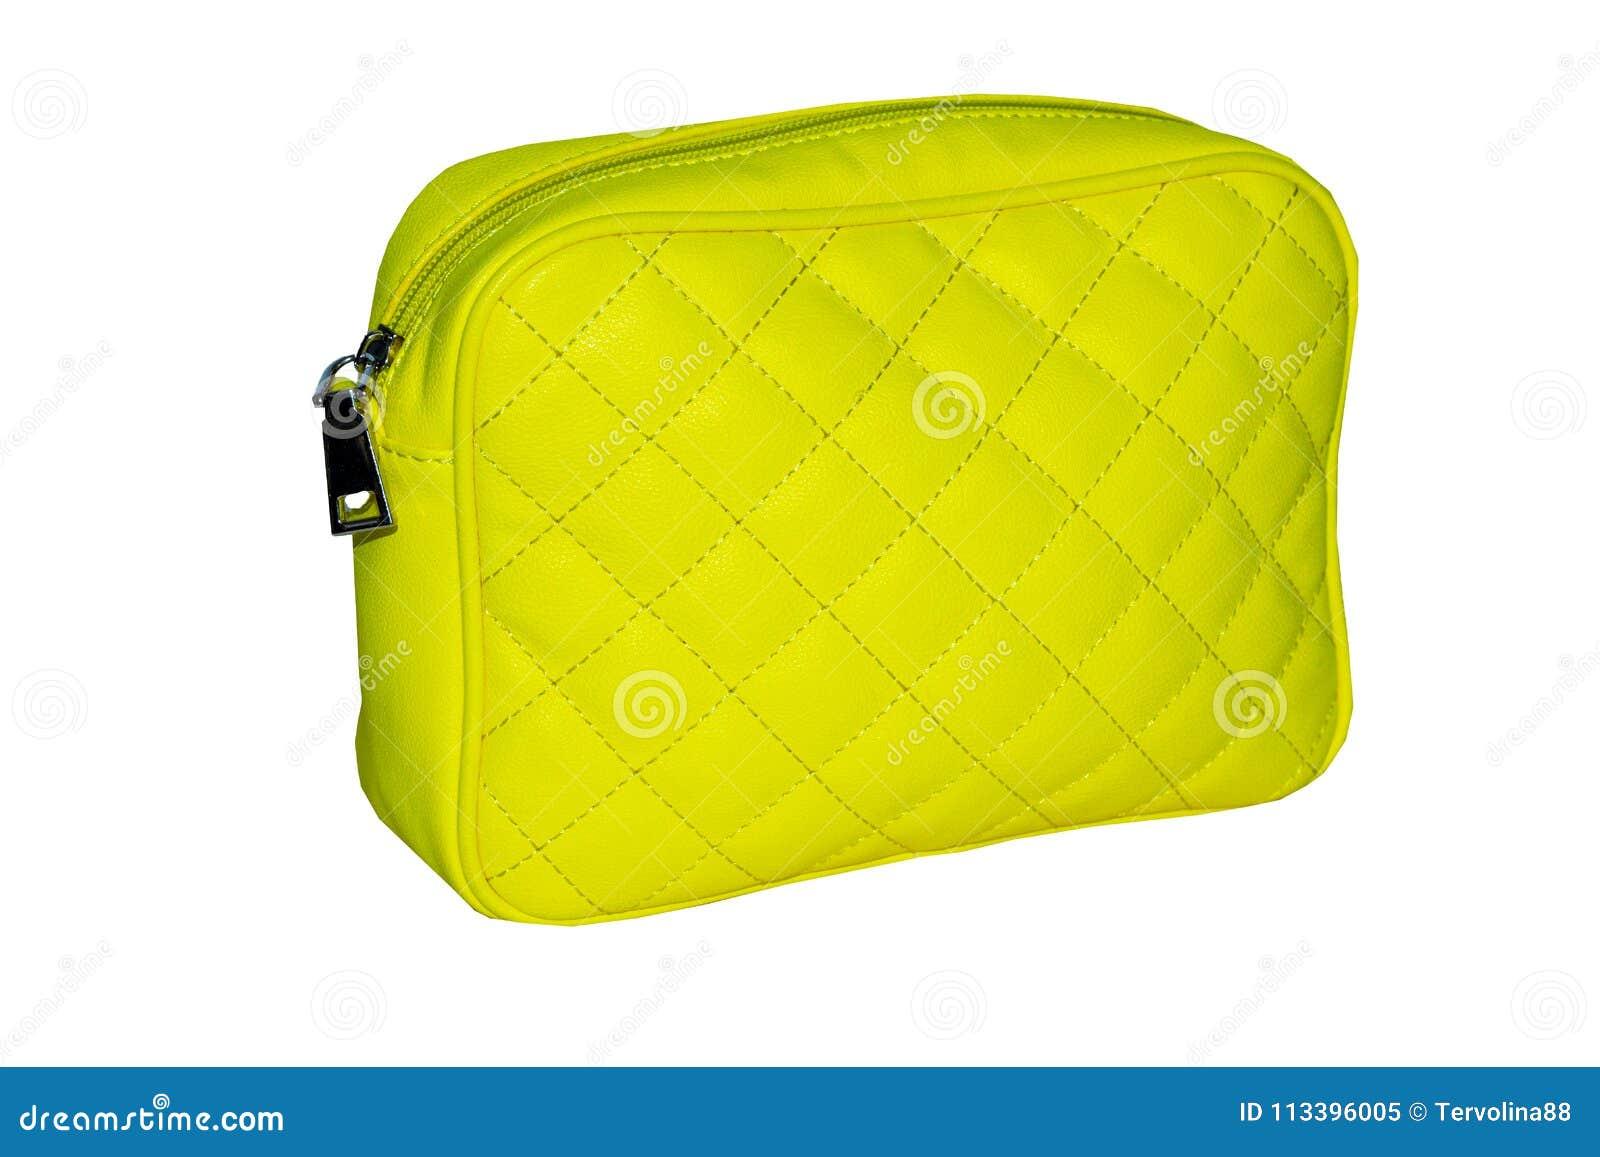 Women`s handbag lemon yellow with a pattern in the form of diamonds